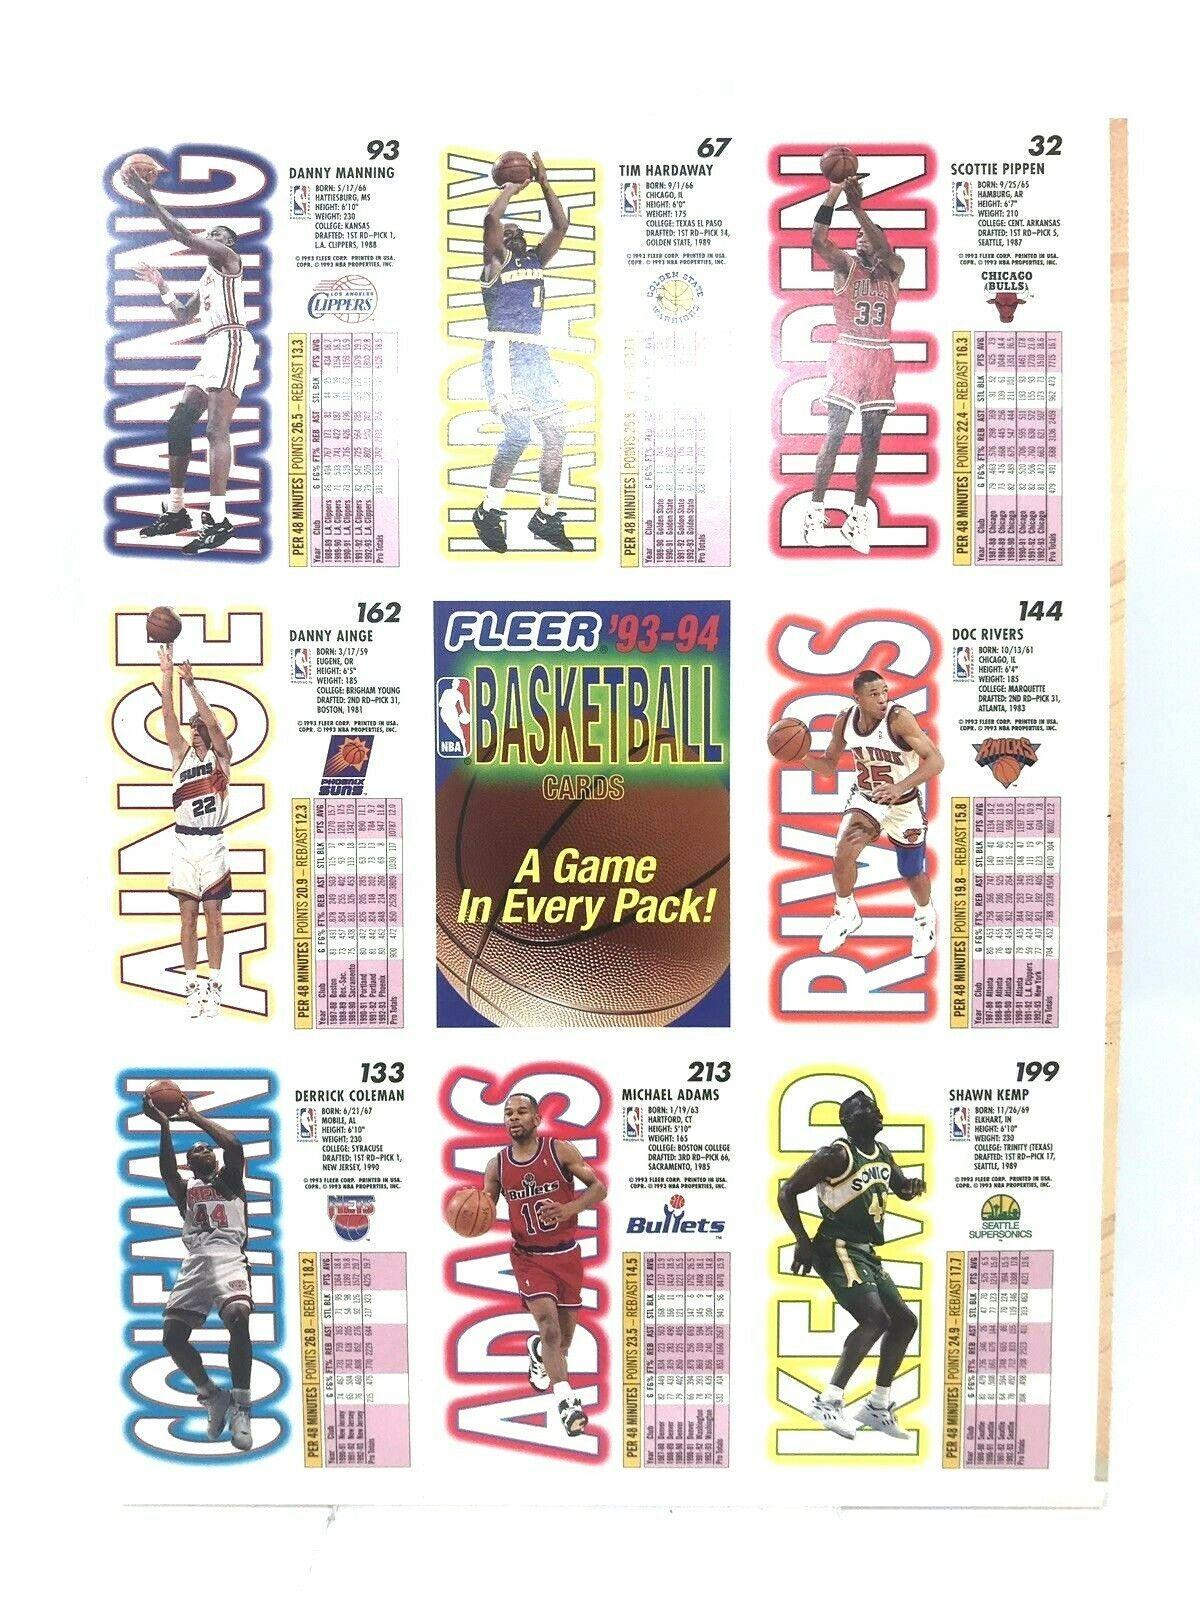 1993-94 Fleer Baskeball Cards Uncut Sheet Pippen Rivers Kemp Hardaway Coleman